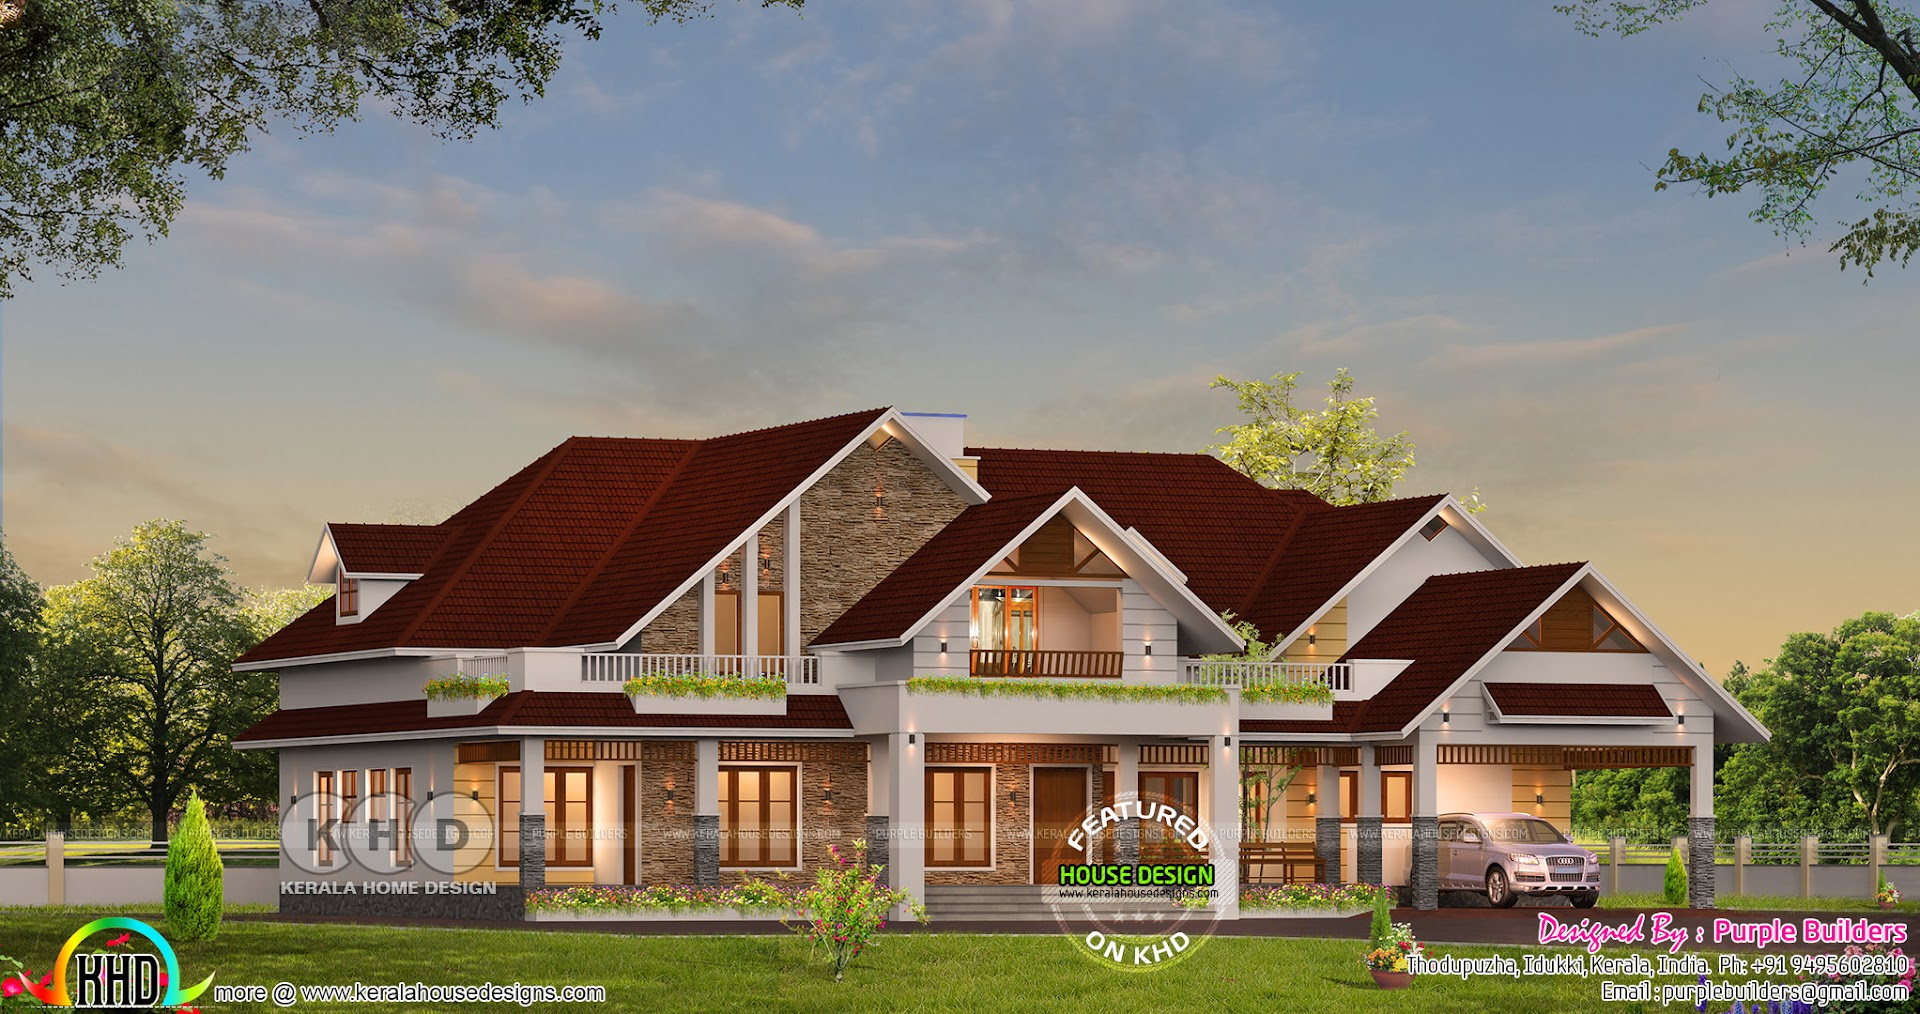 Sloping roof 4 bedroom bungalow home in kerala